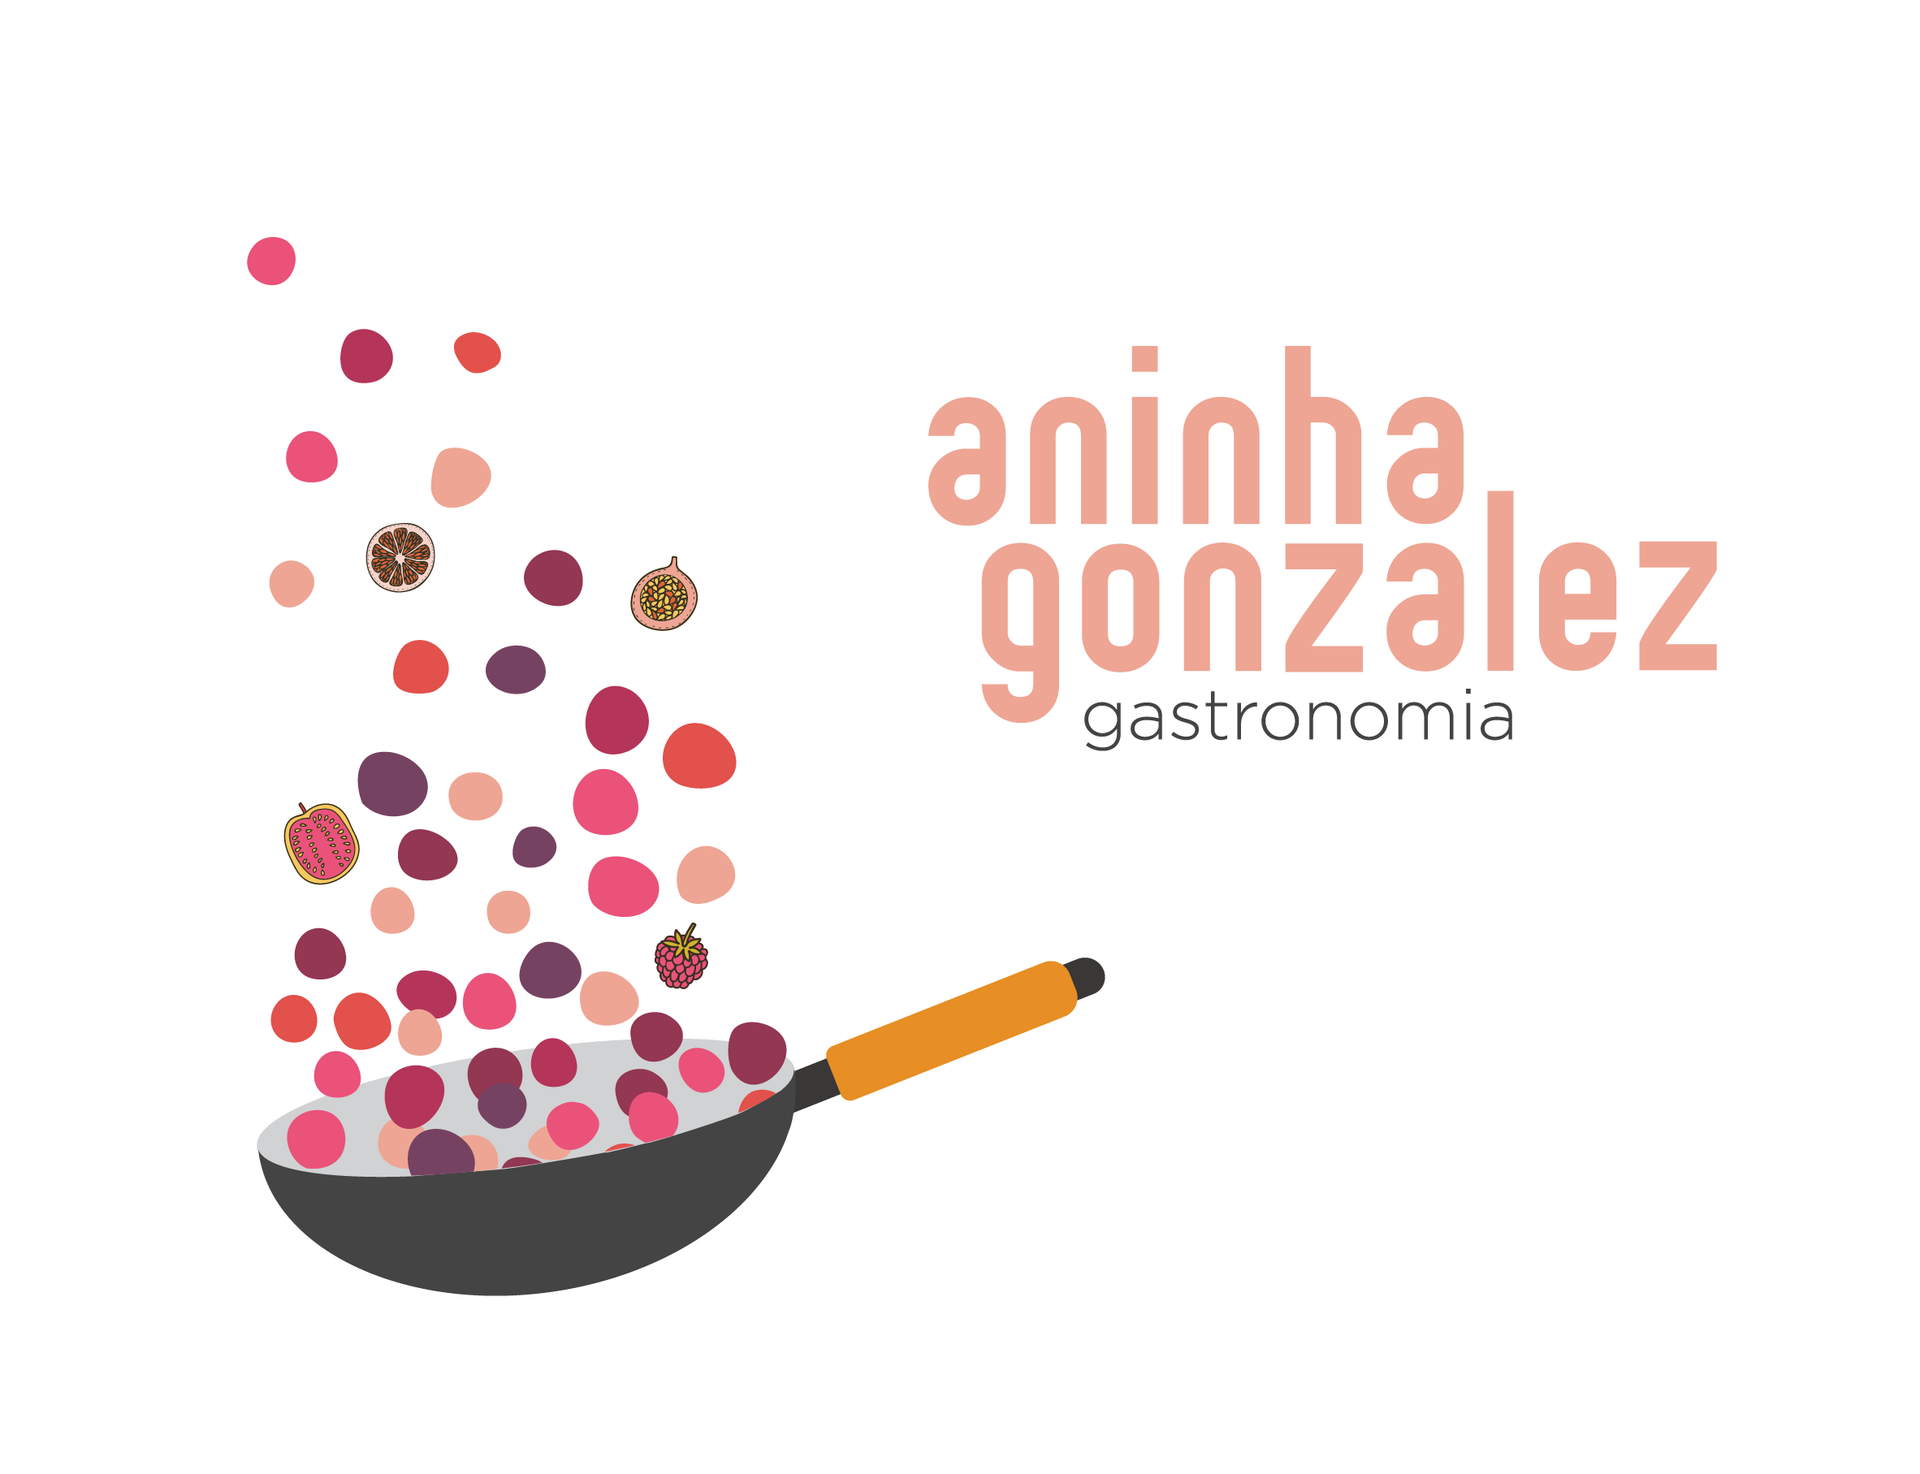 Logotipo Aninha Gonzalez Gastronomia